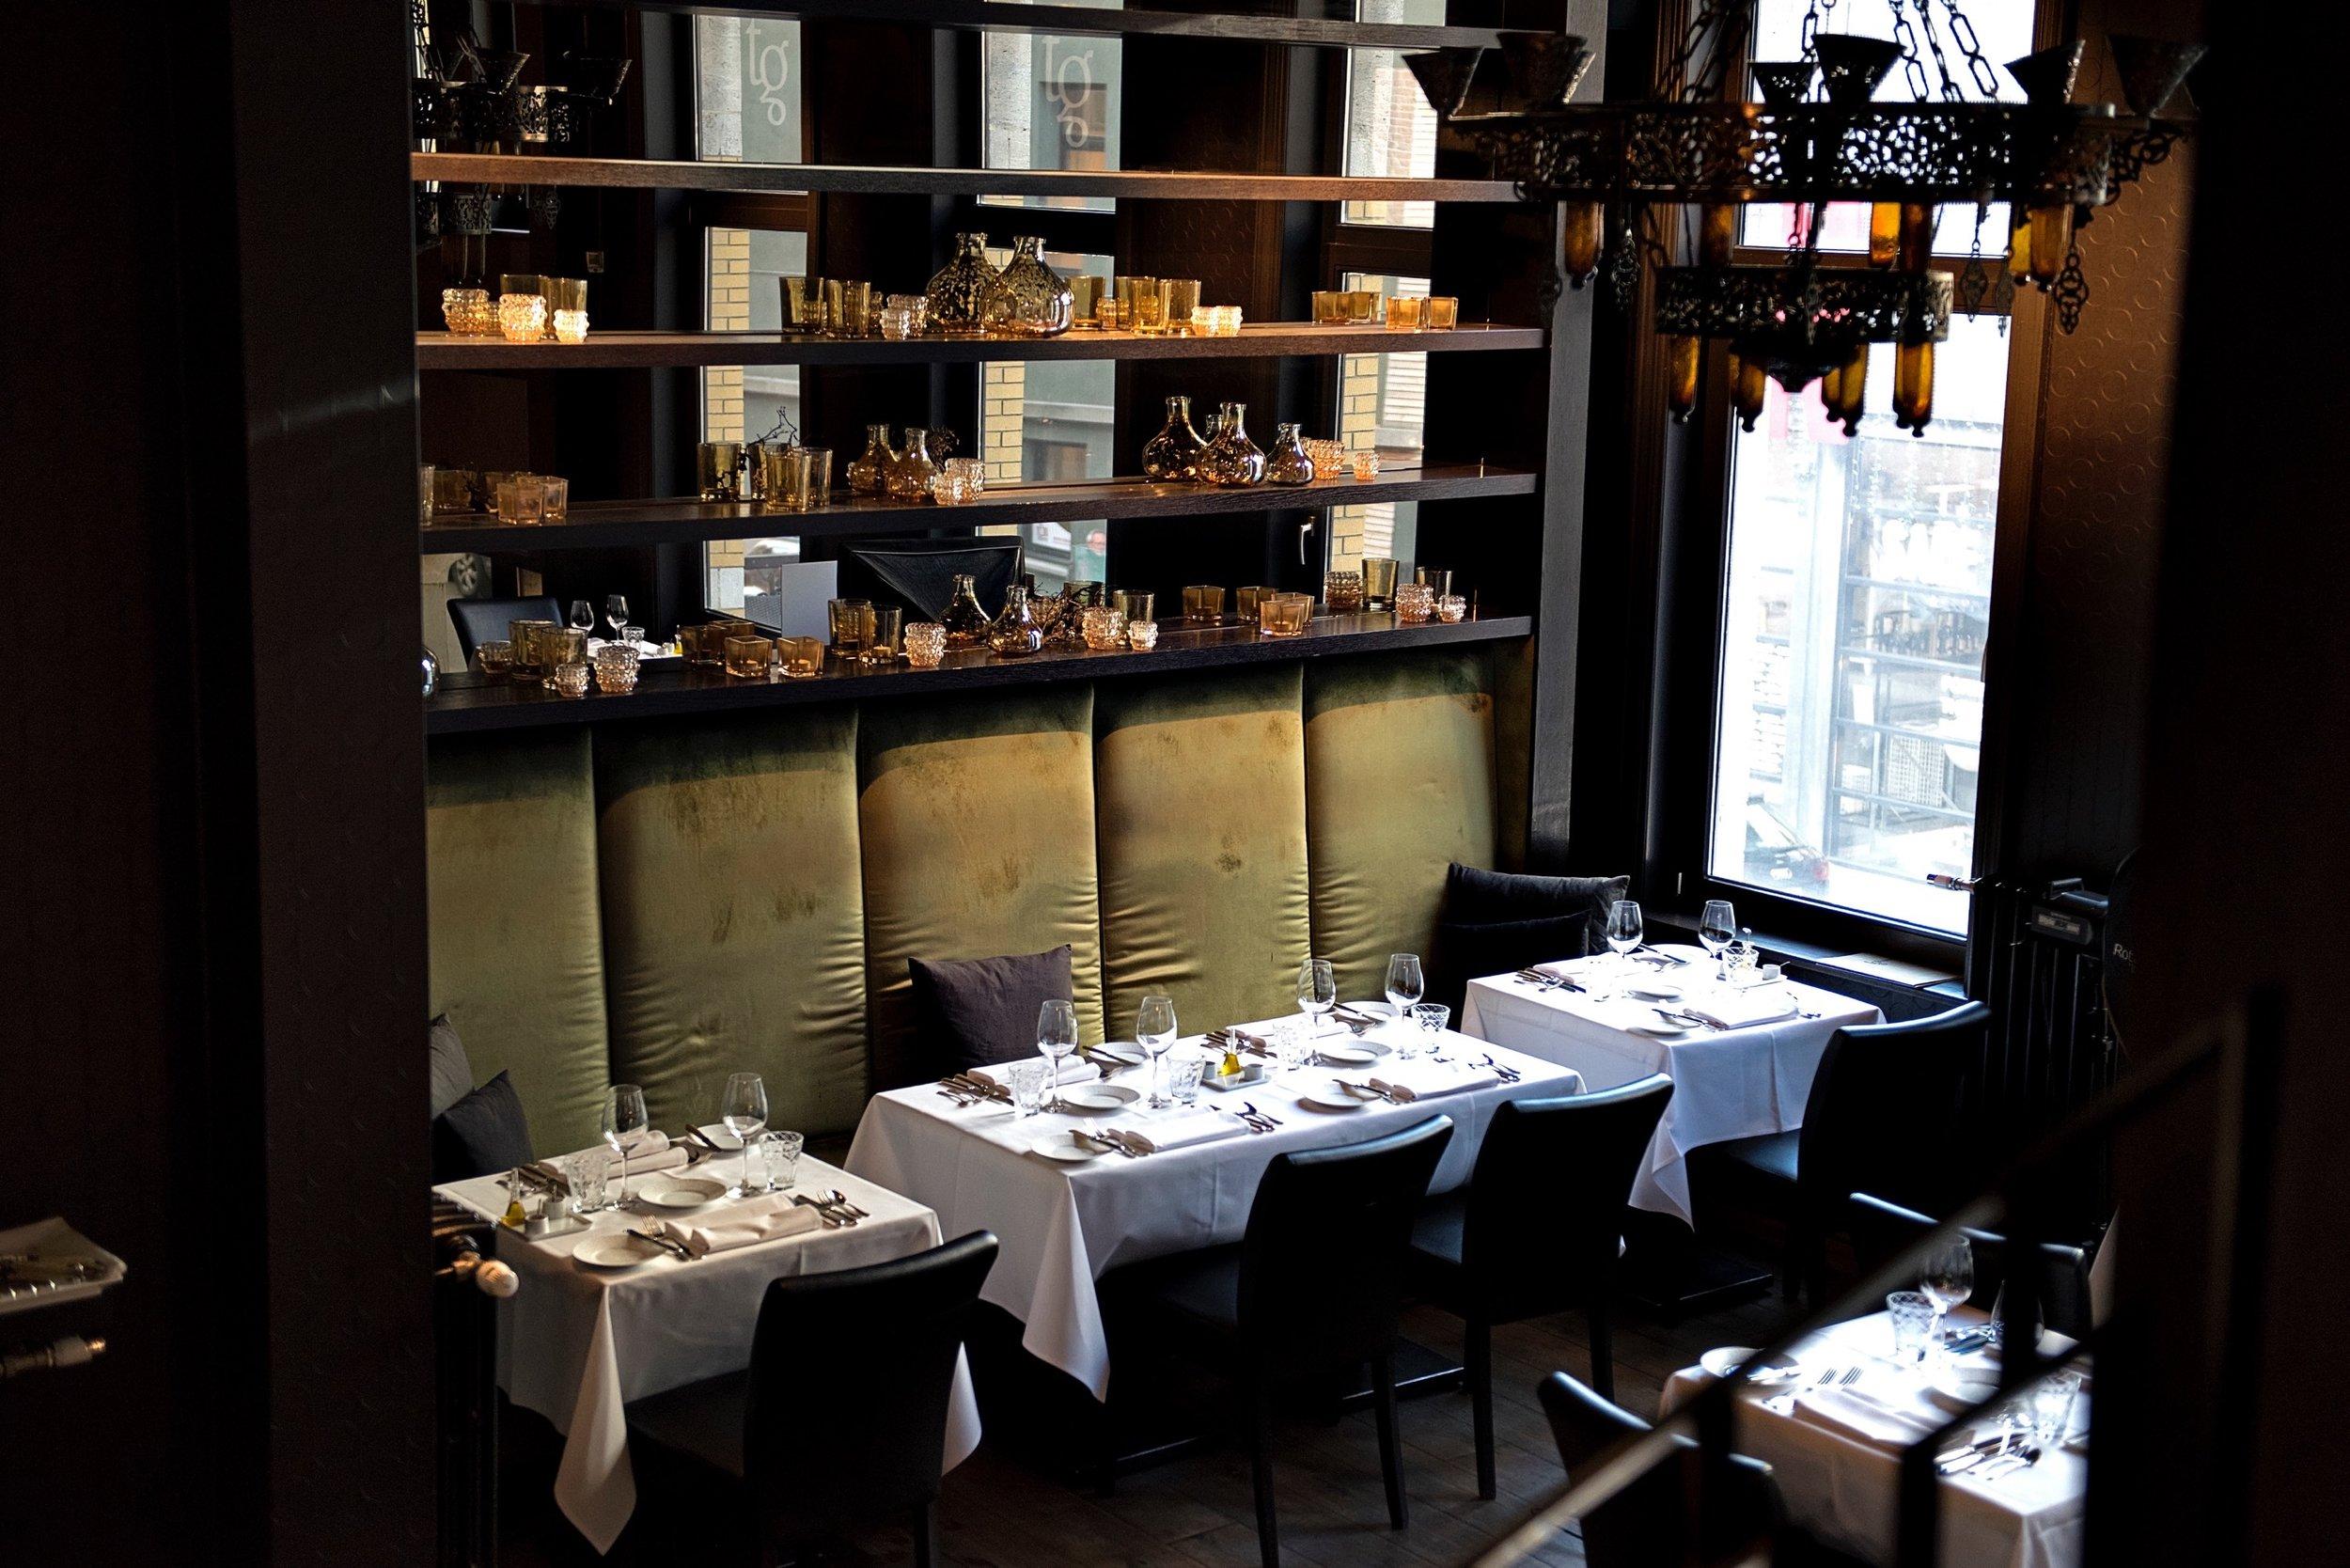 12 michelin restaurant the glorious antwerpen tablefever bart albrecht.jpg